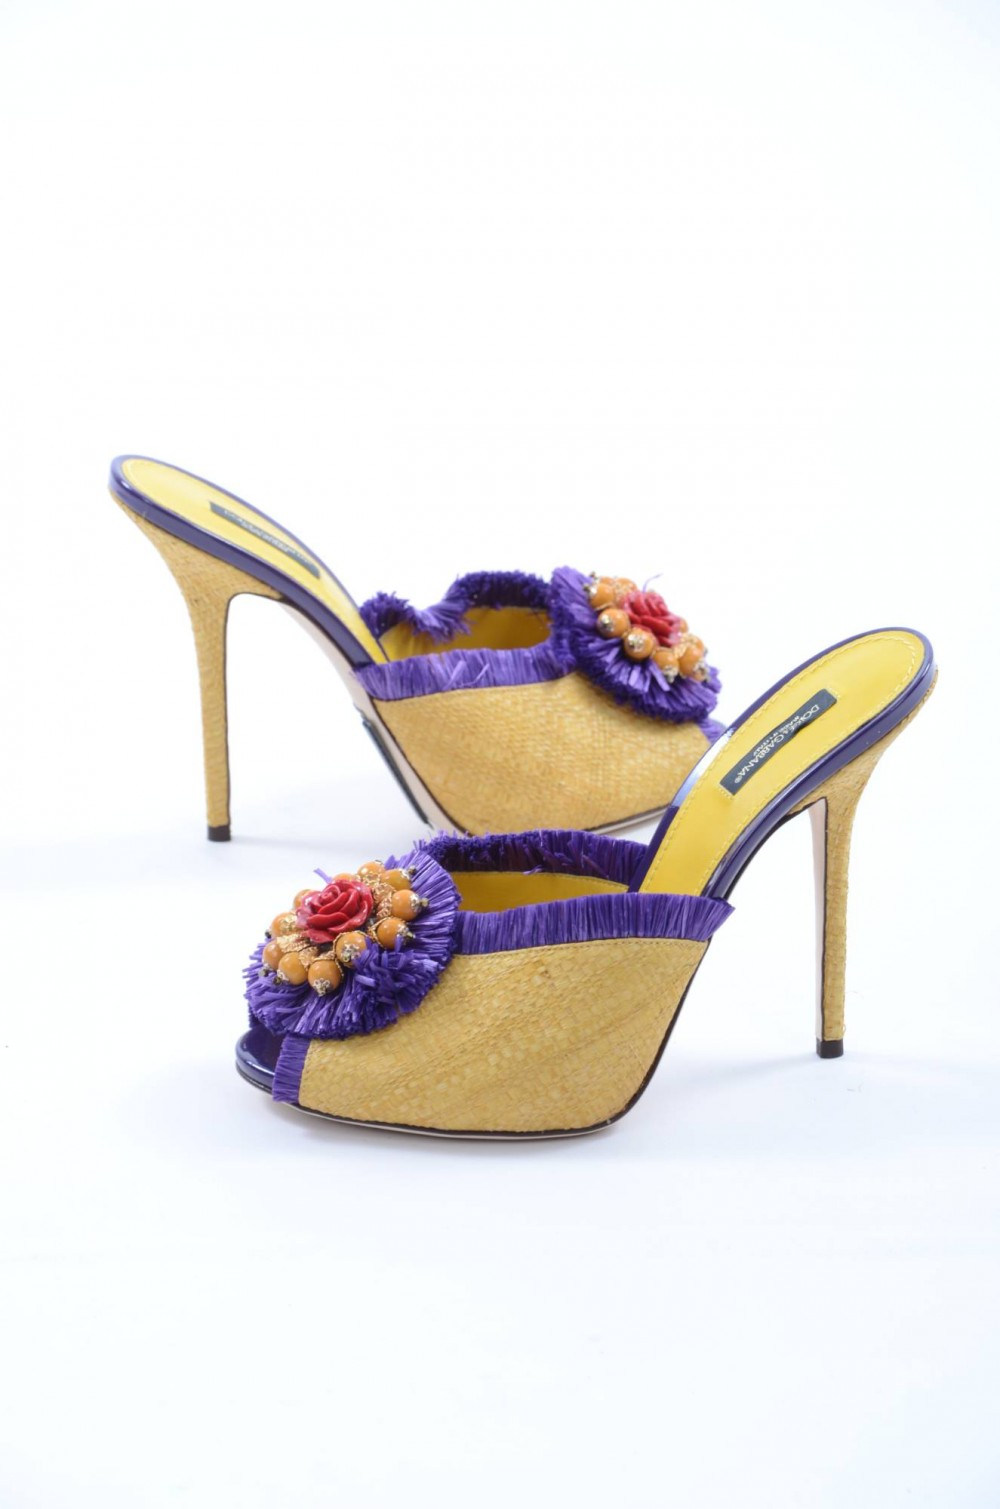 Mujer Gabbana Sandalias Ag869 Tacón Cr0356 Dolceamp; De BrtdQhsCx